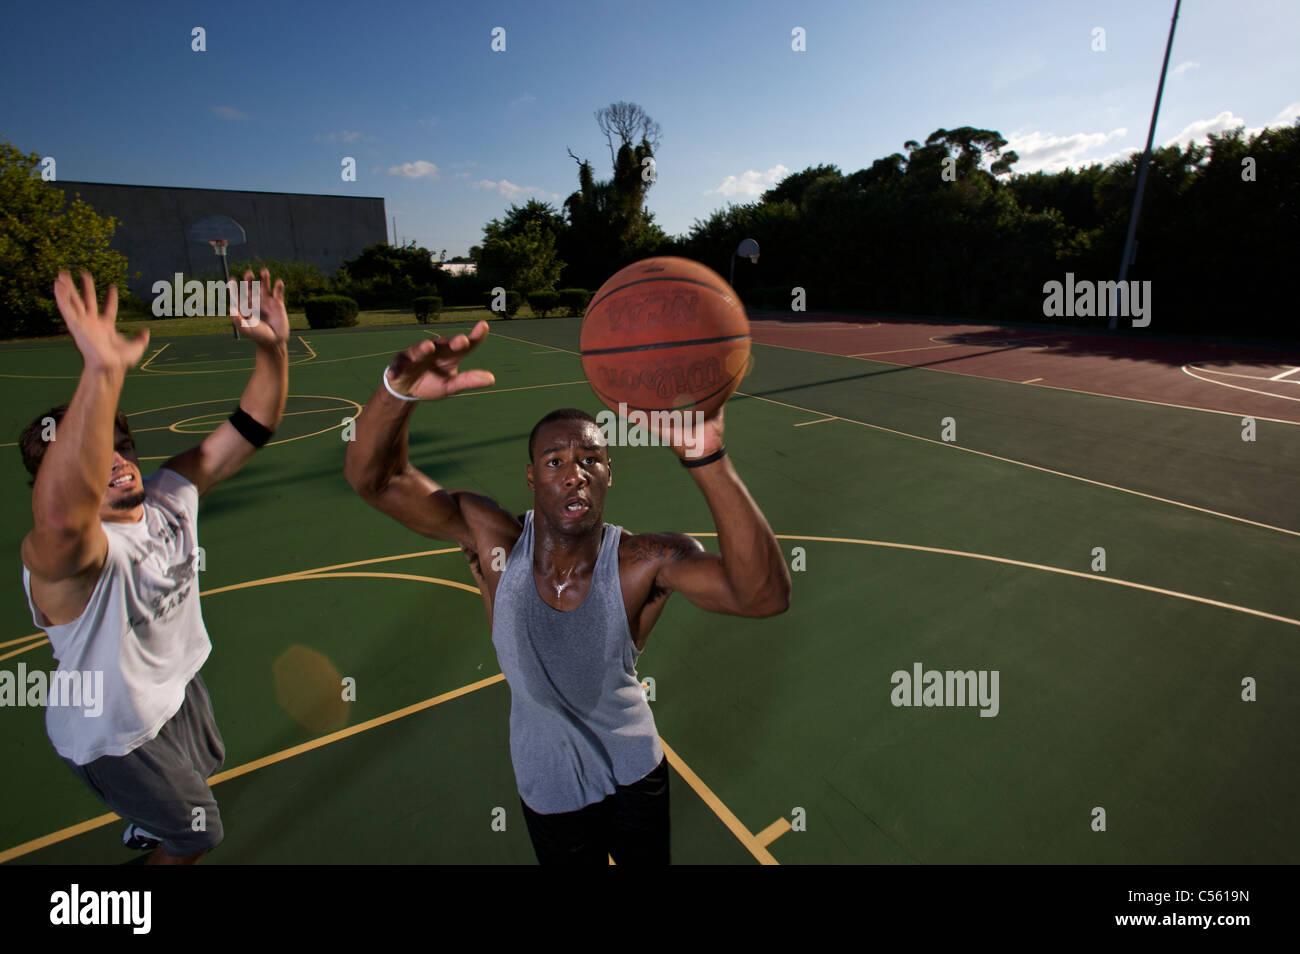 Männer spielen im freien Basketballspiel Stockbild